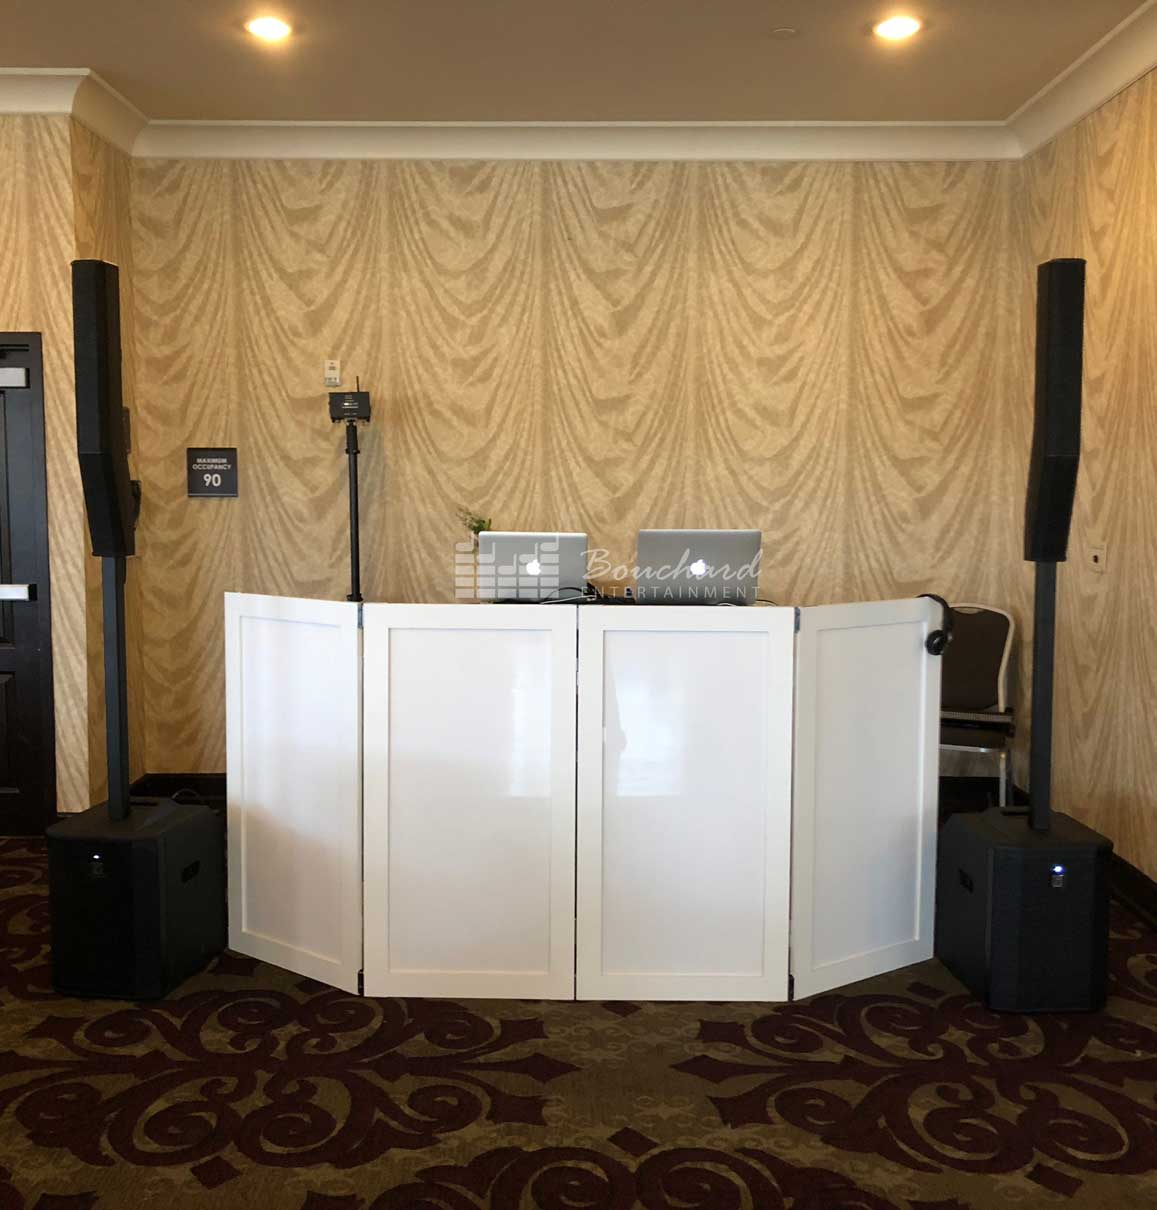 Maine Wedding DJ Setup at A Hotel Banquet Hall